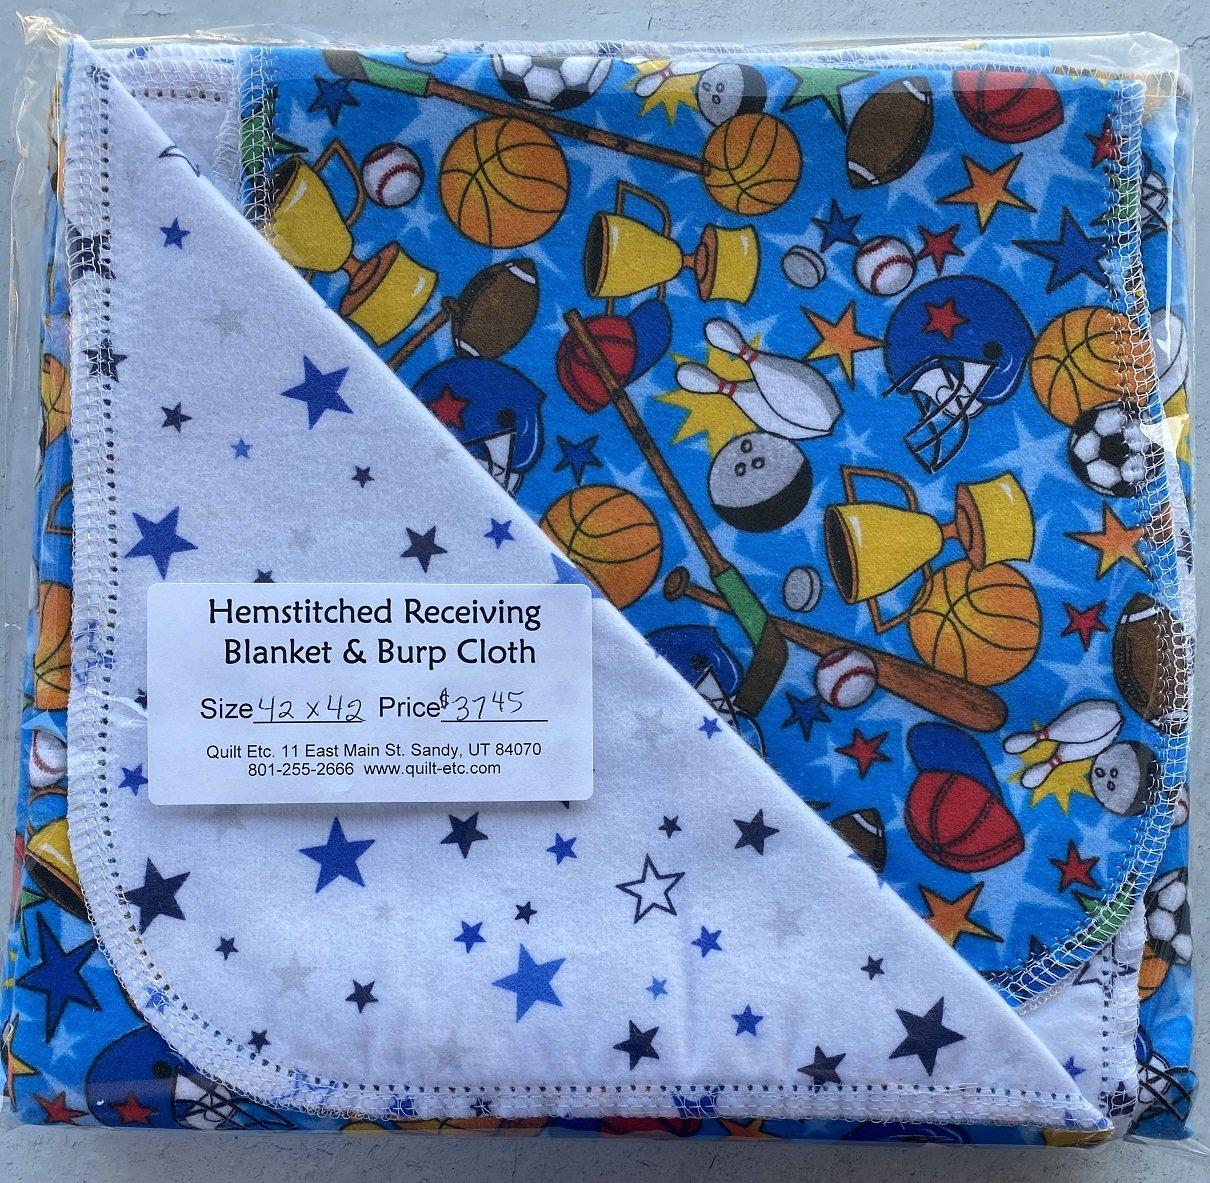 Hemstitched Receiving Blanket & Burp Cloth 17